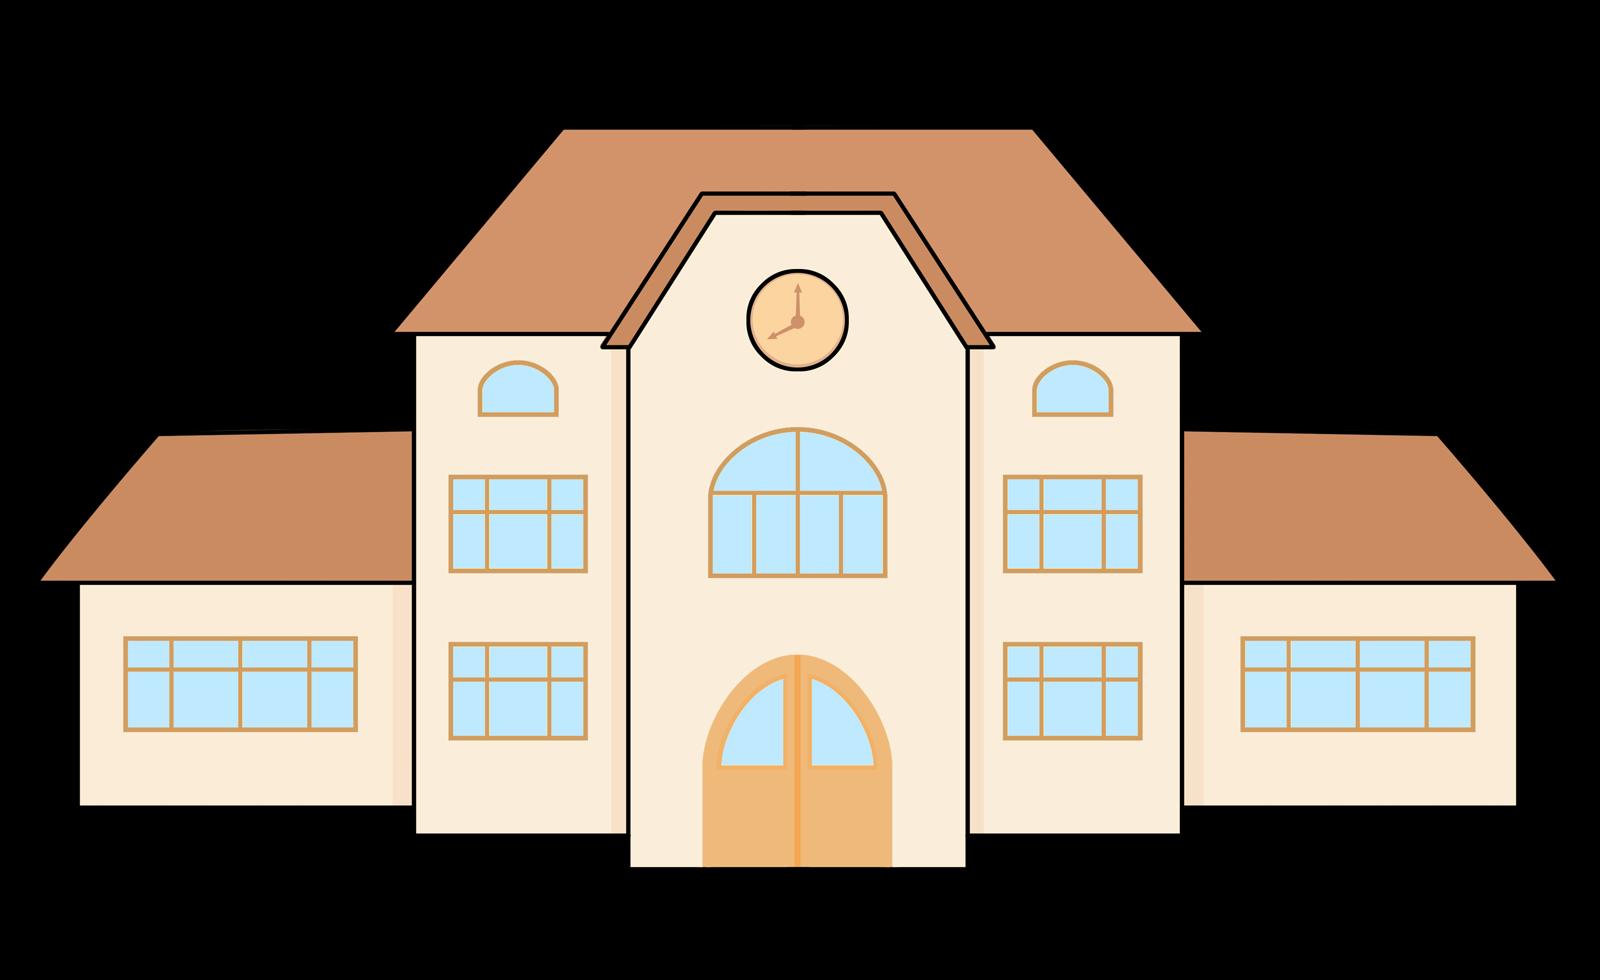 Free Cartoon School Building Clip Art-Free Cartoon School Building Clip Art-4